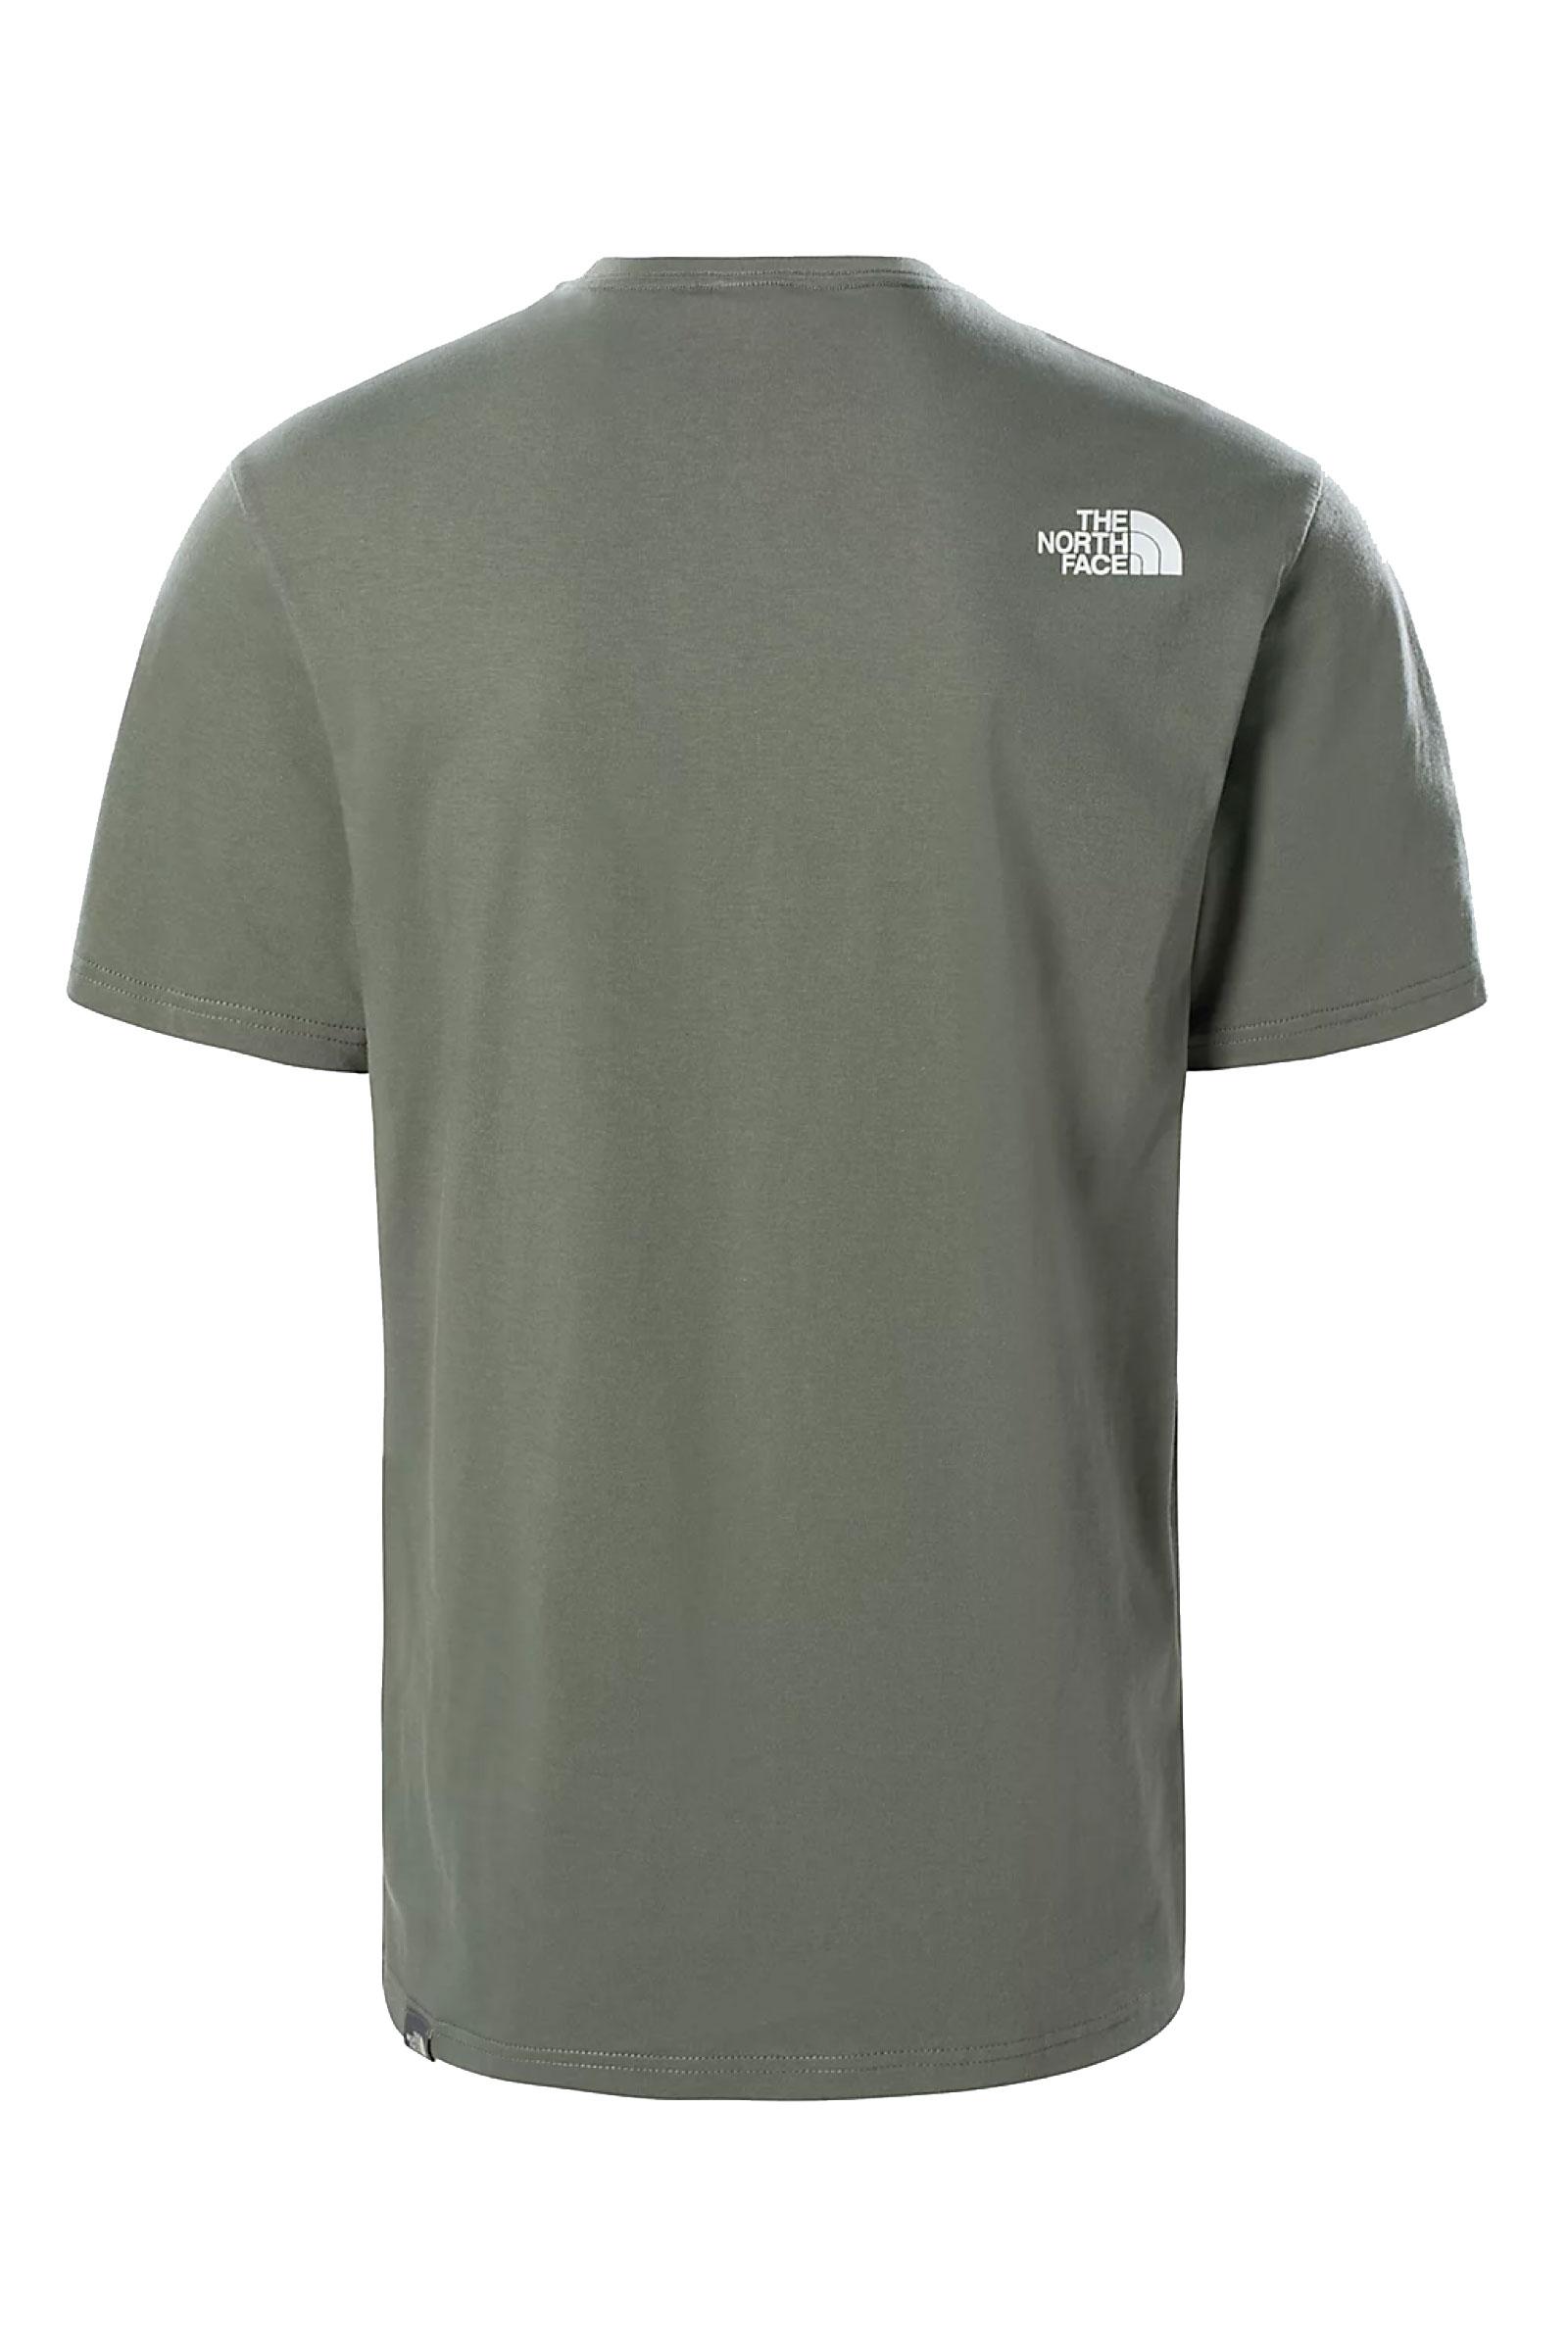 THE NORTH FACE | T-Shirt | NF0A2TX3V381